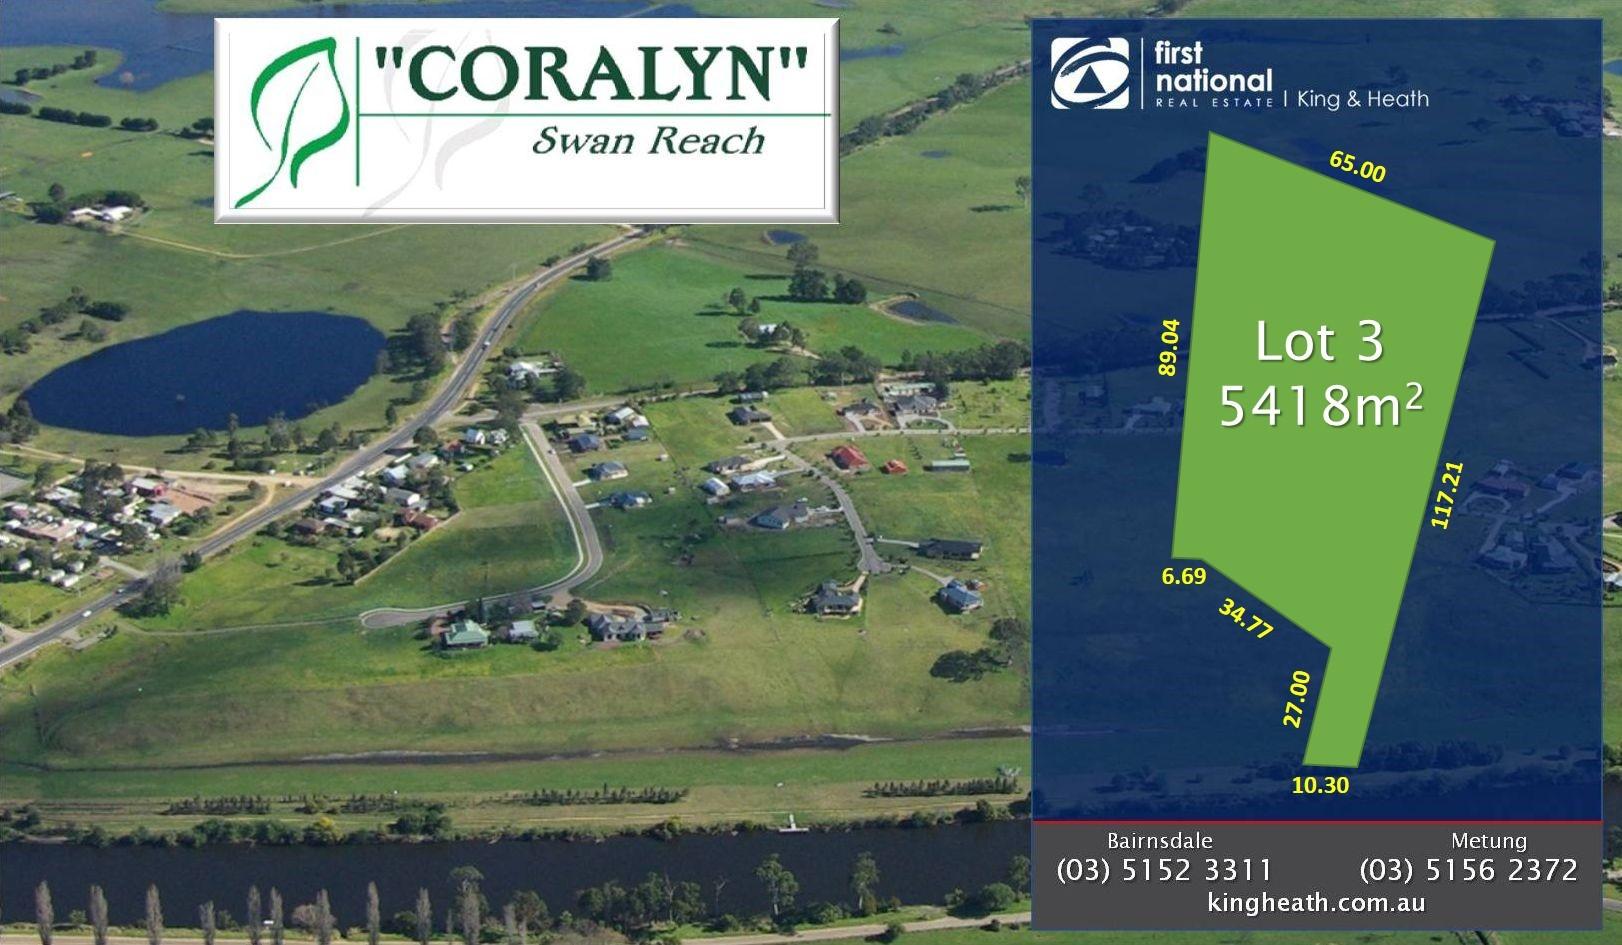 Lot 3 Coralyn Drive, Swan Reach VIC 3903-1